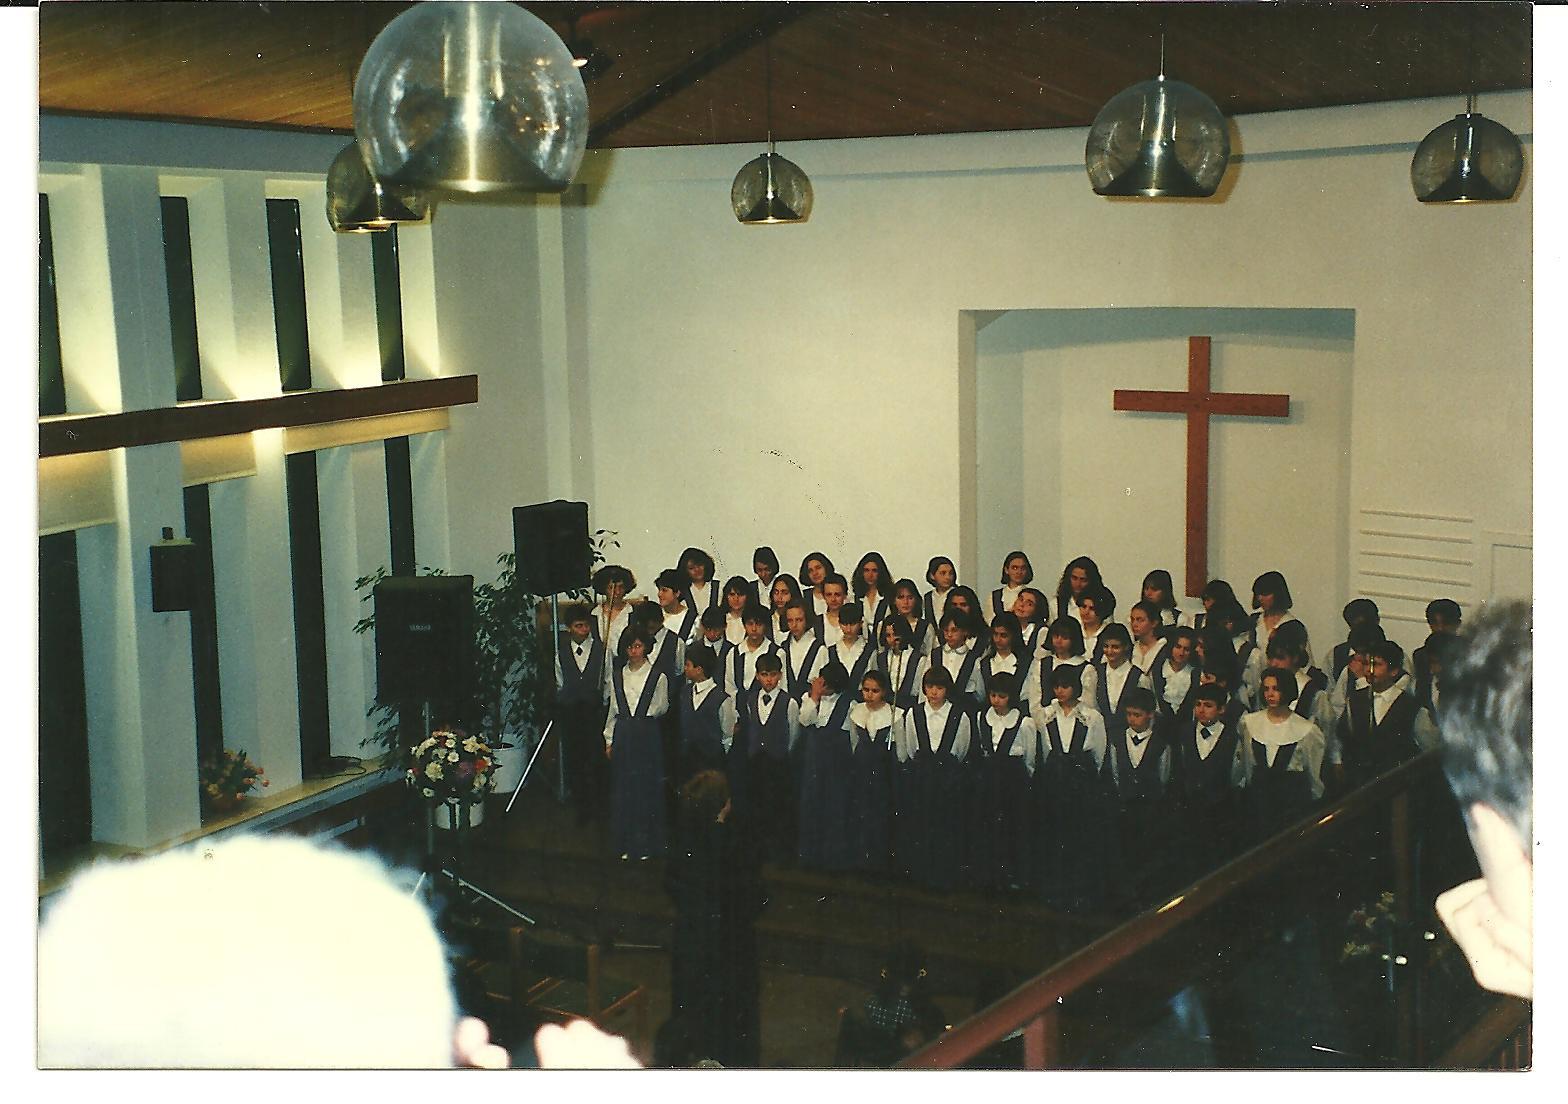 08.Luneburg-(Germania)-27.03.1998.jpg